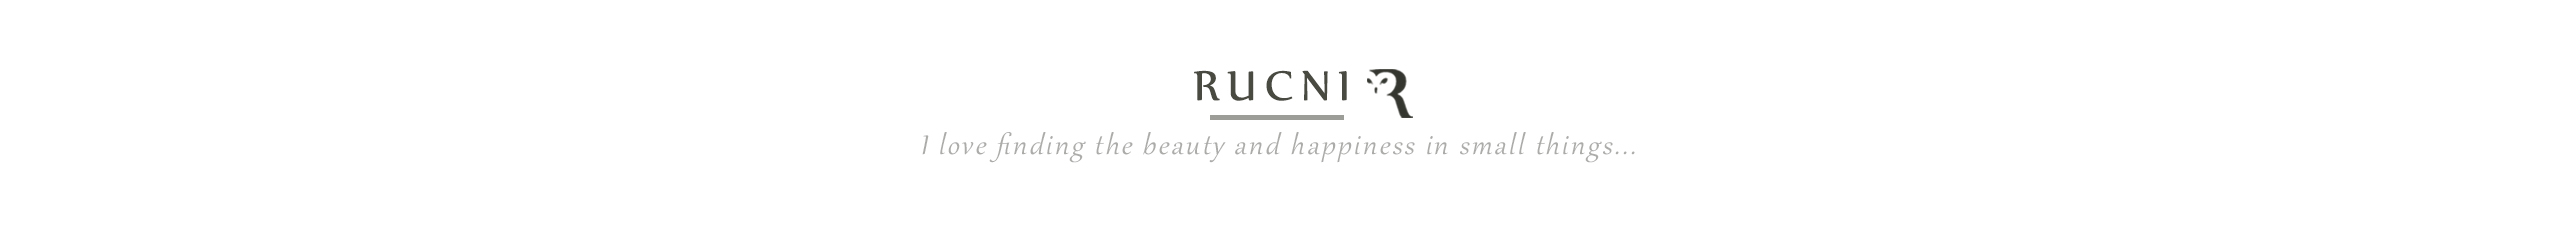 RUCNI